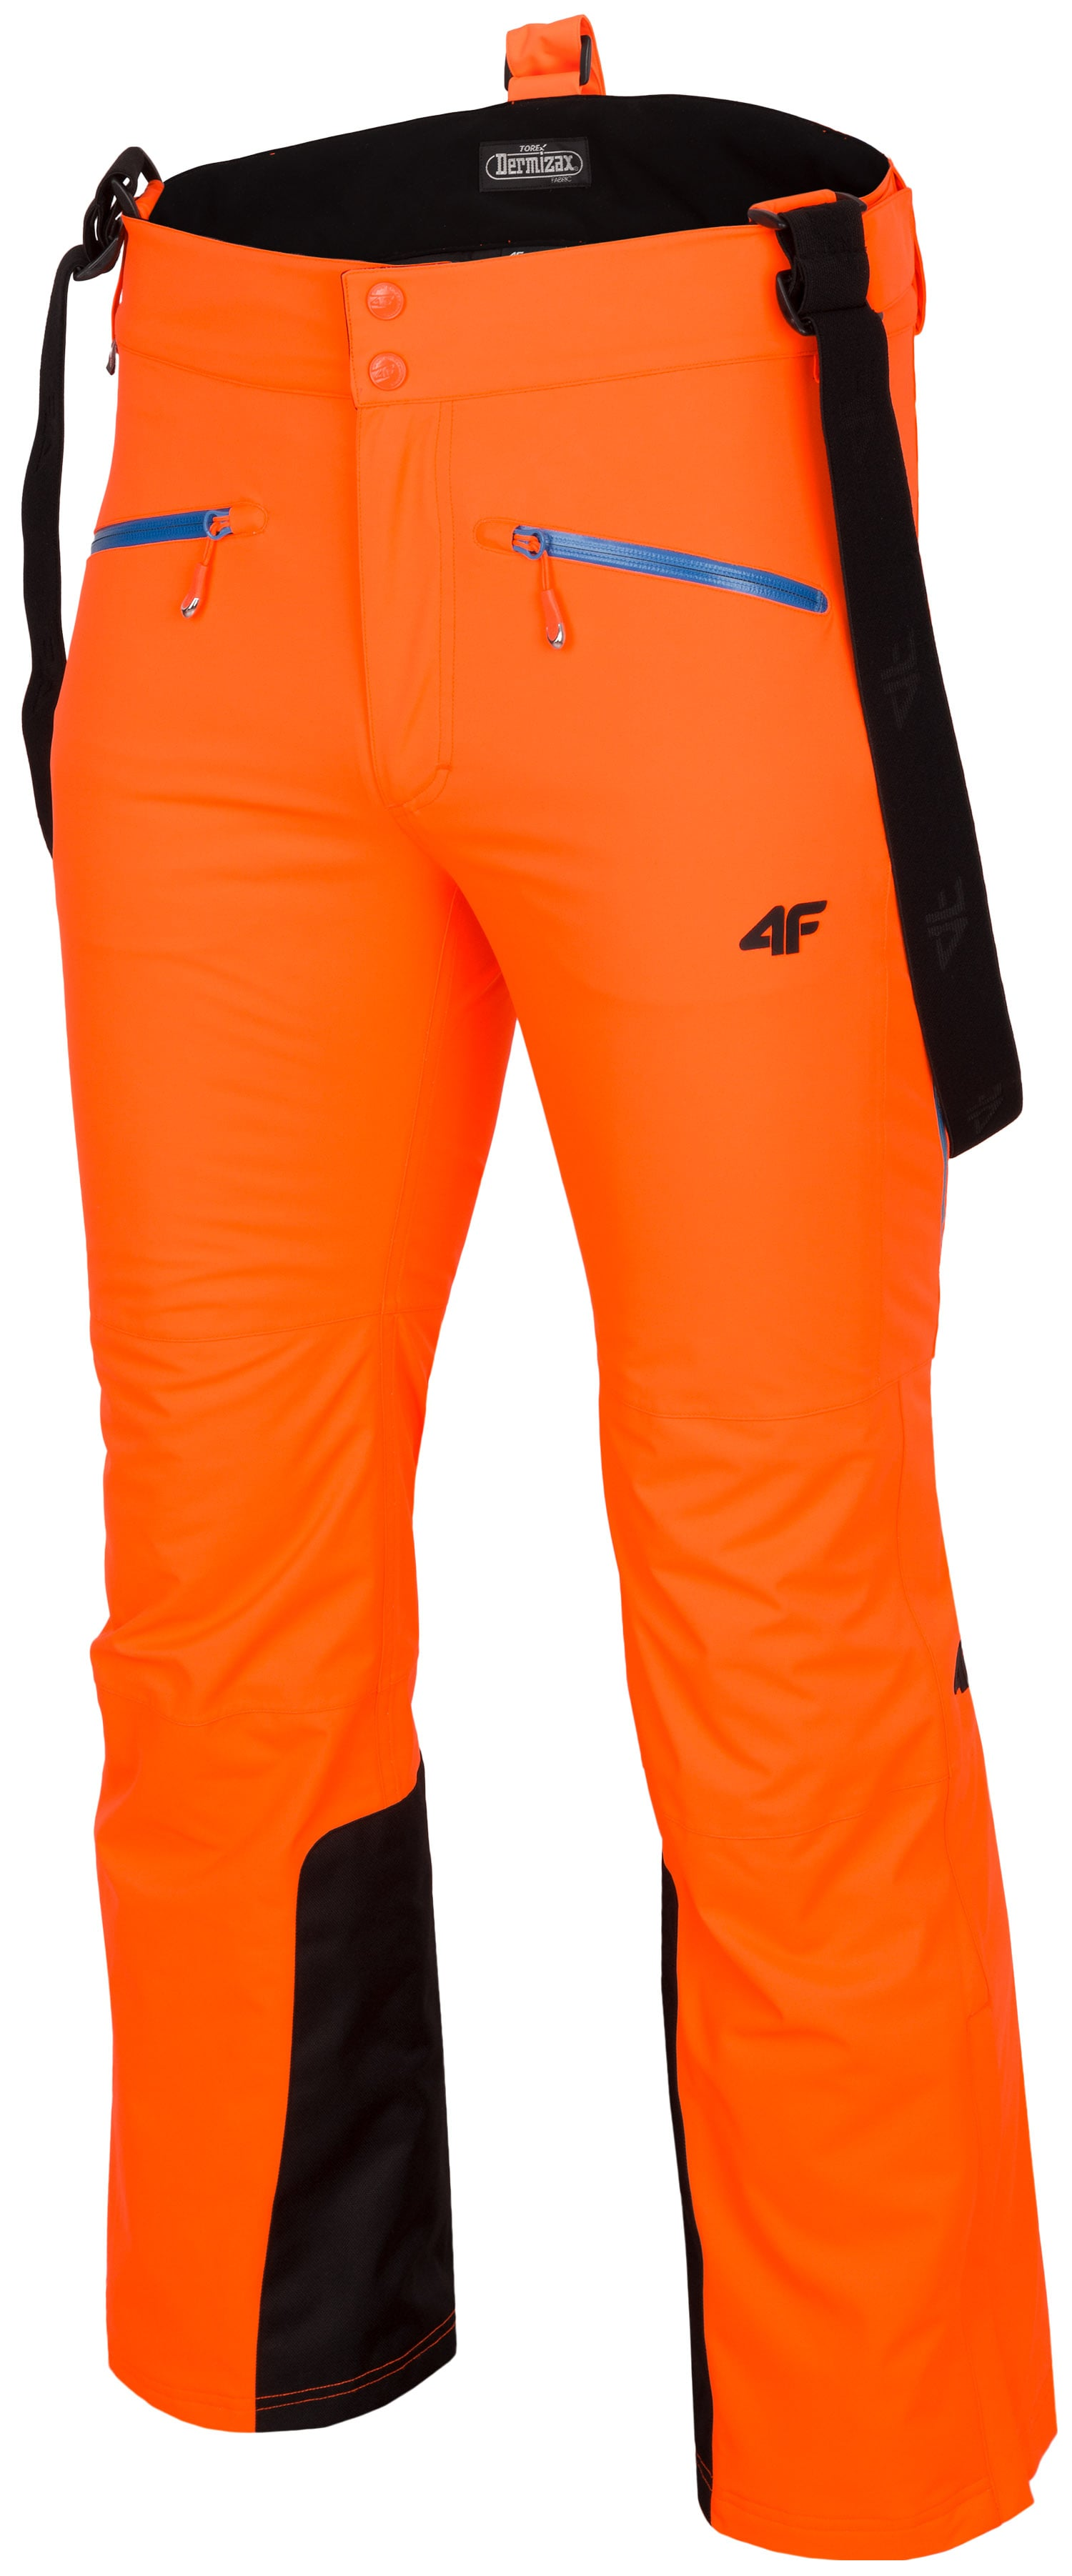 4f sport performance spodnie narciarskie